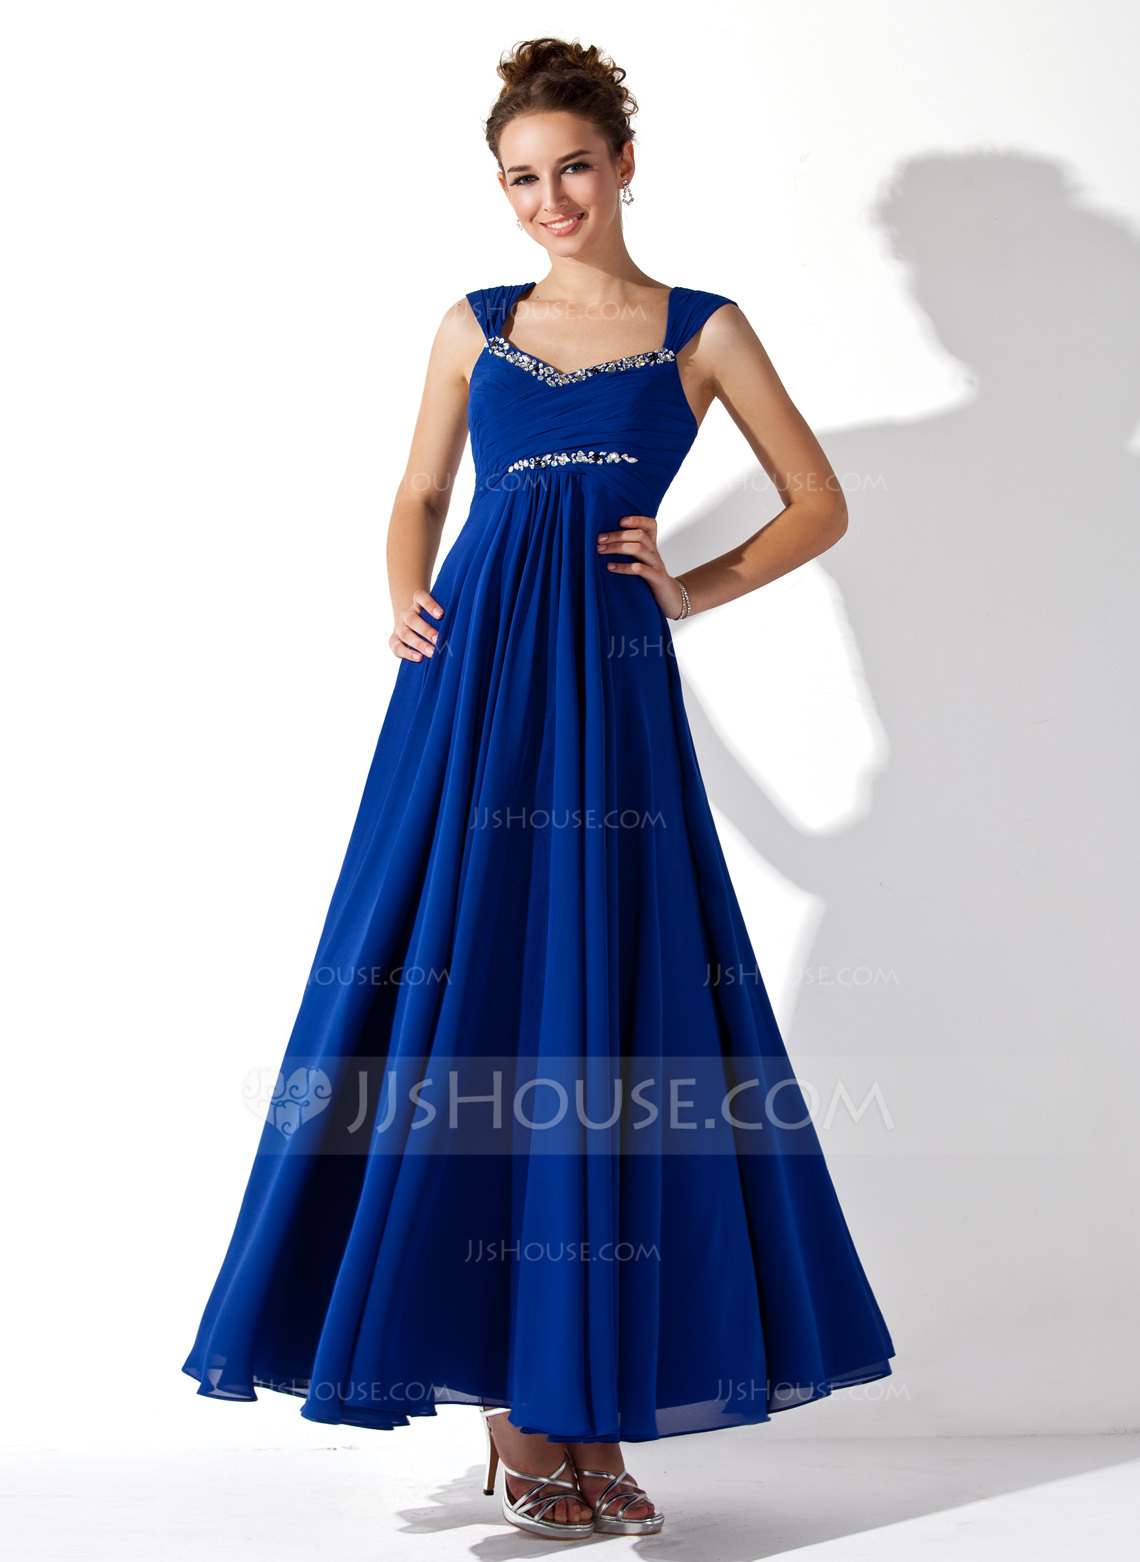 ALinePrincess Vneck AnkleLength Chiffon Prom Dress